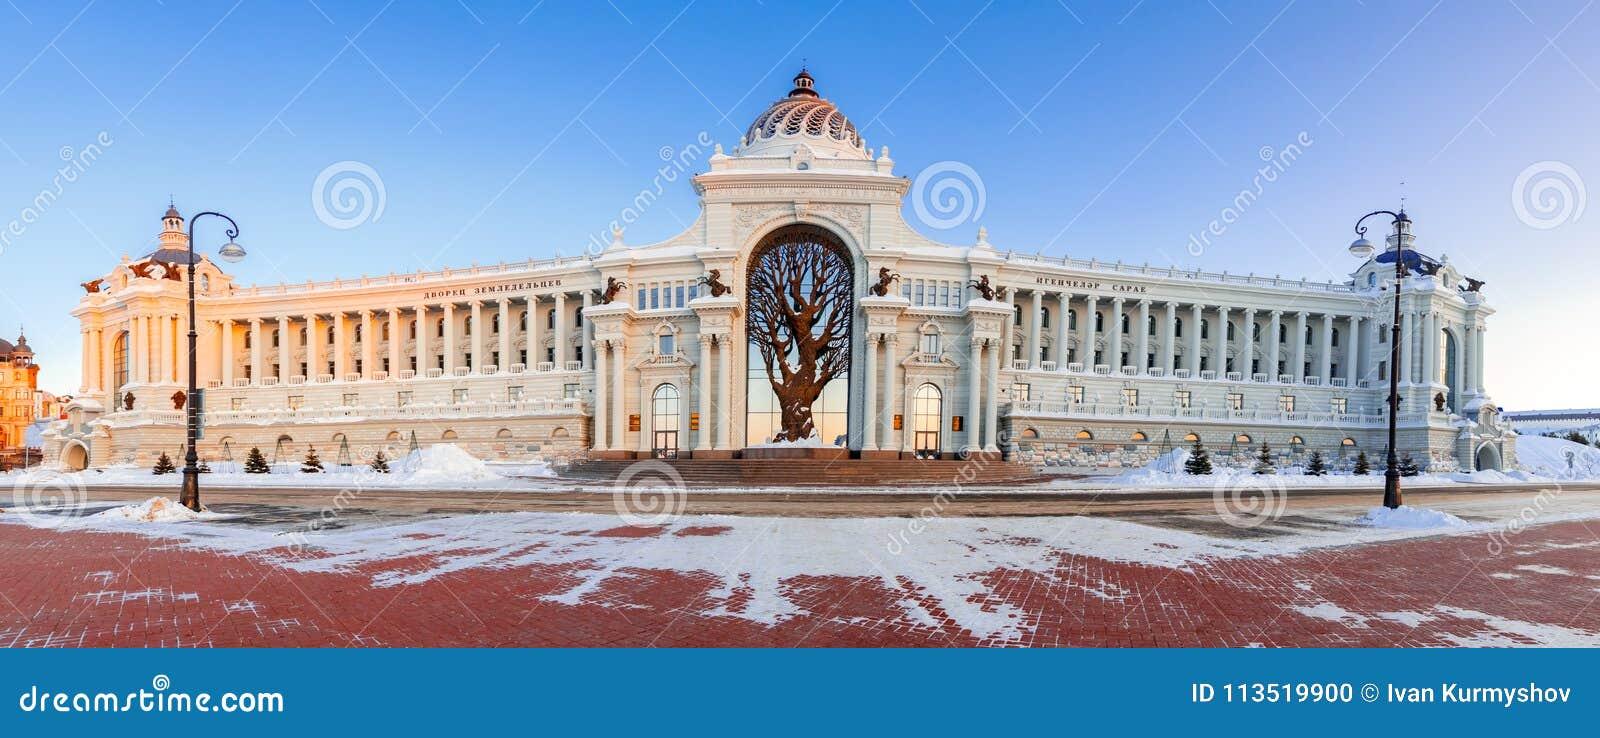 Cidade de Kazan, Rússia